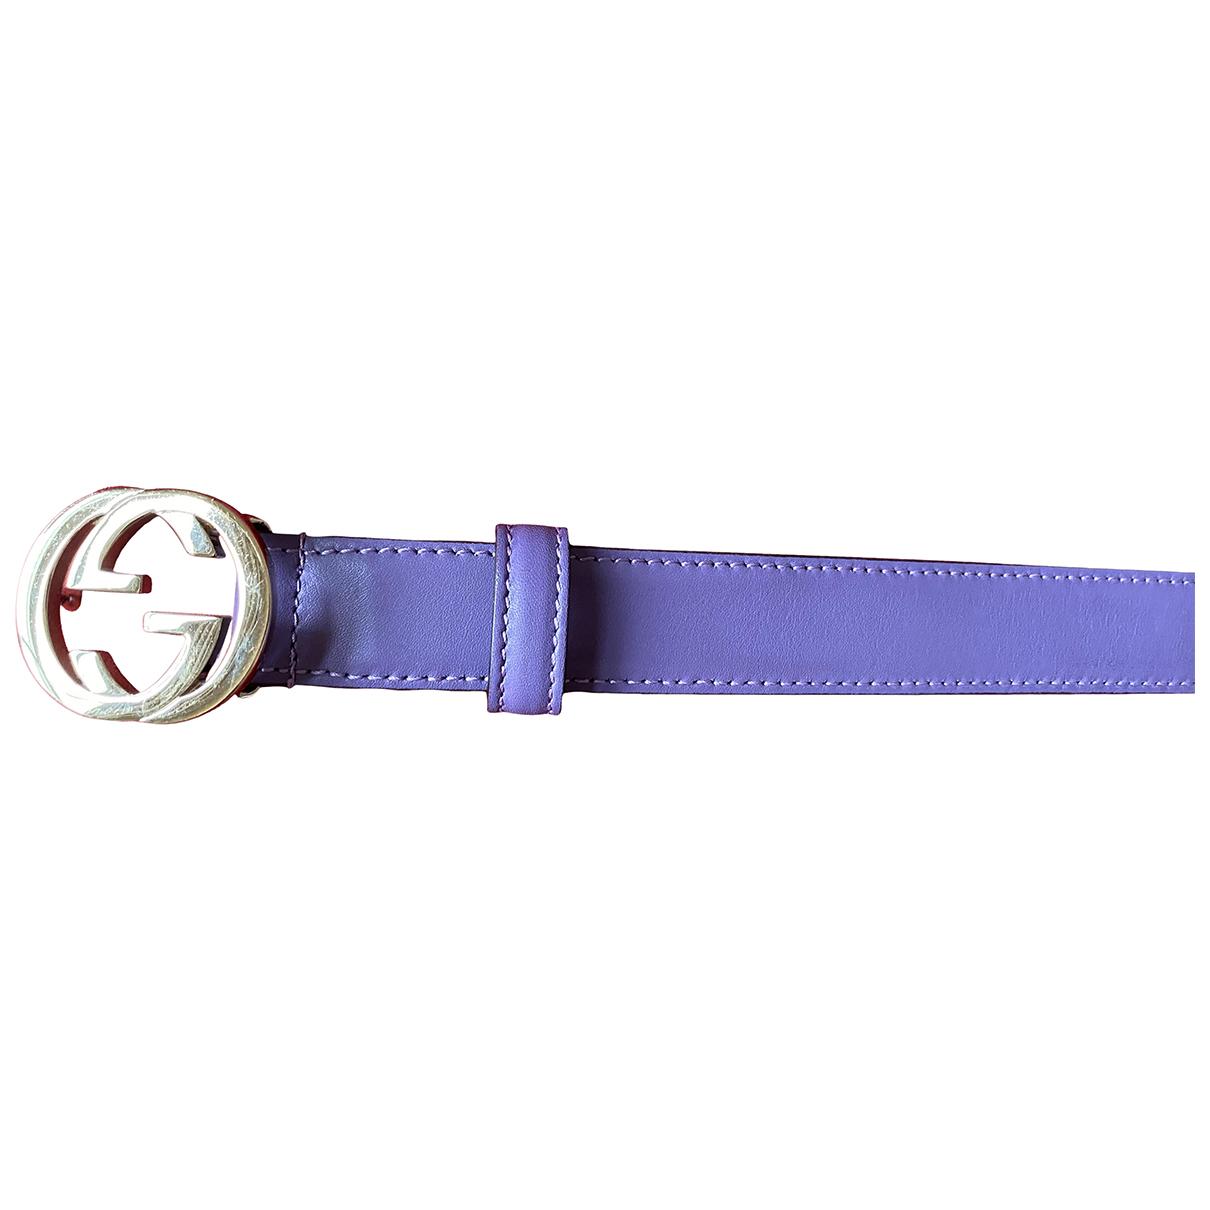 Gucci Interlocking Buckle Purple Leather belt for Women 80 cm